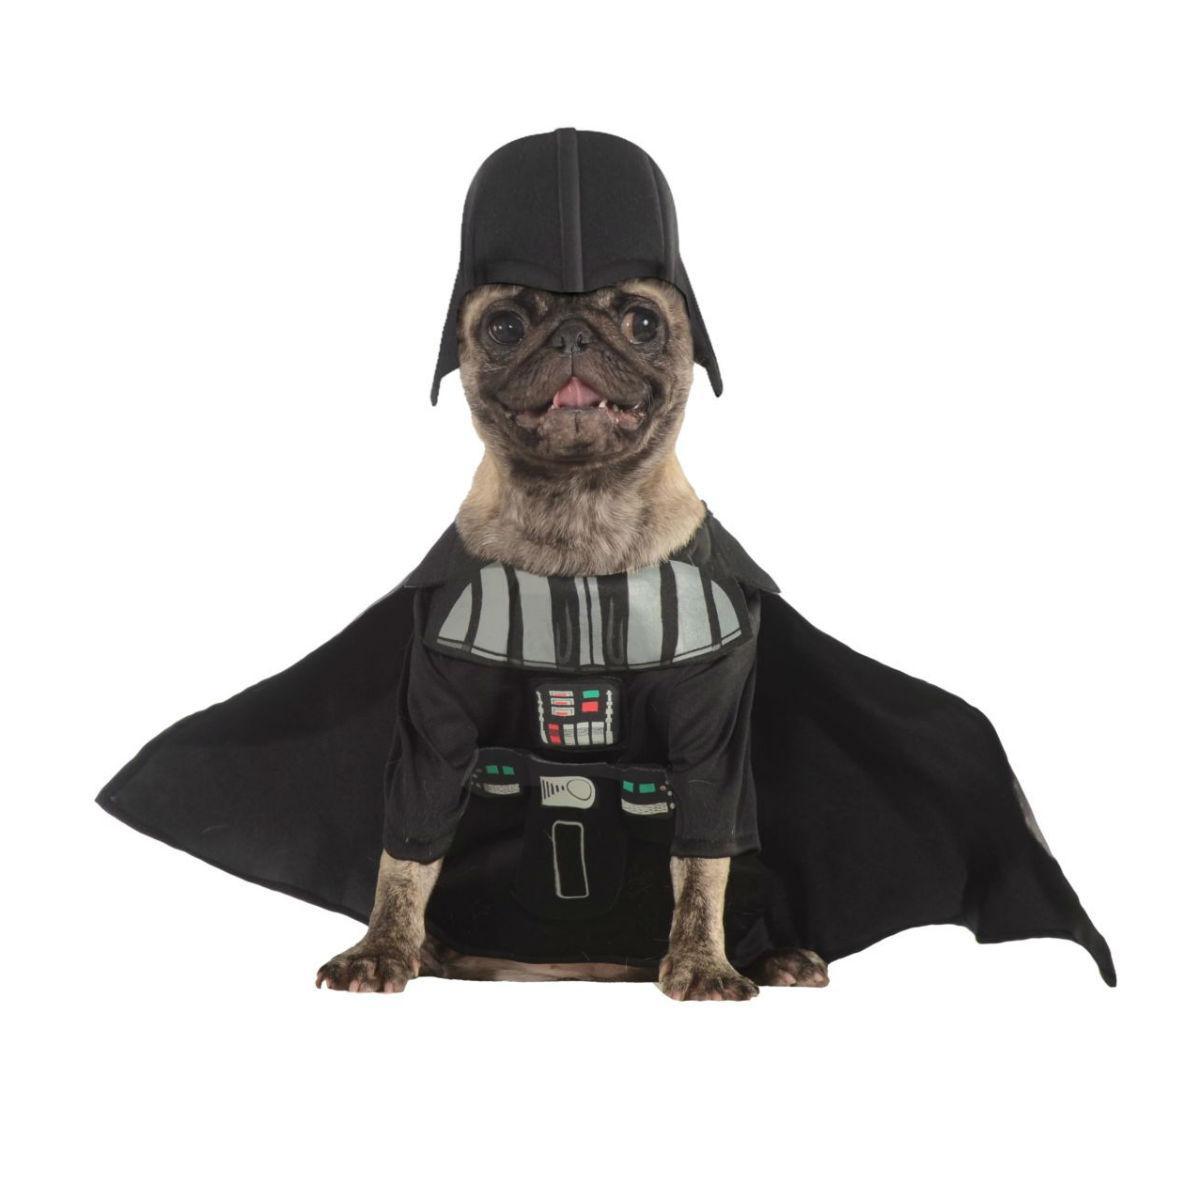 Star Wars Darth Vader Dog Costume by Rubies